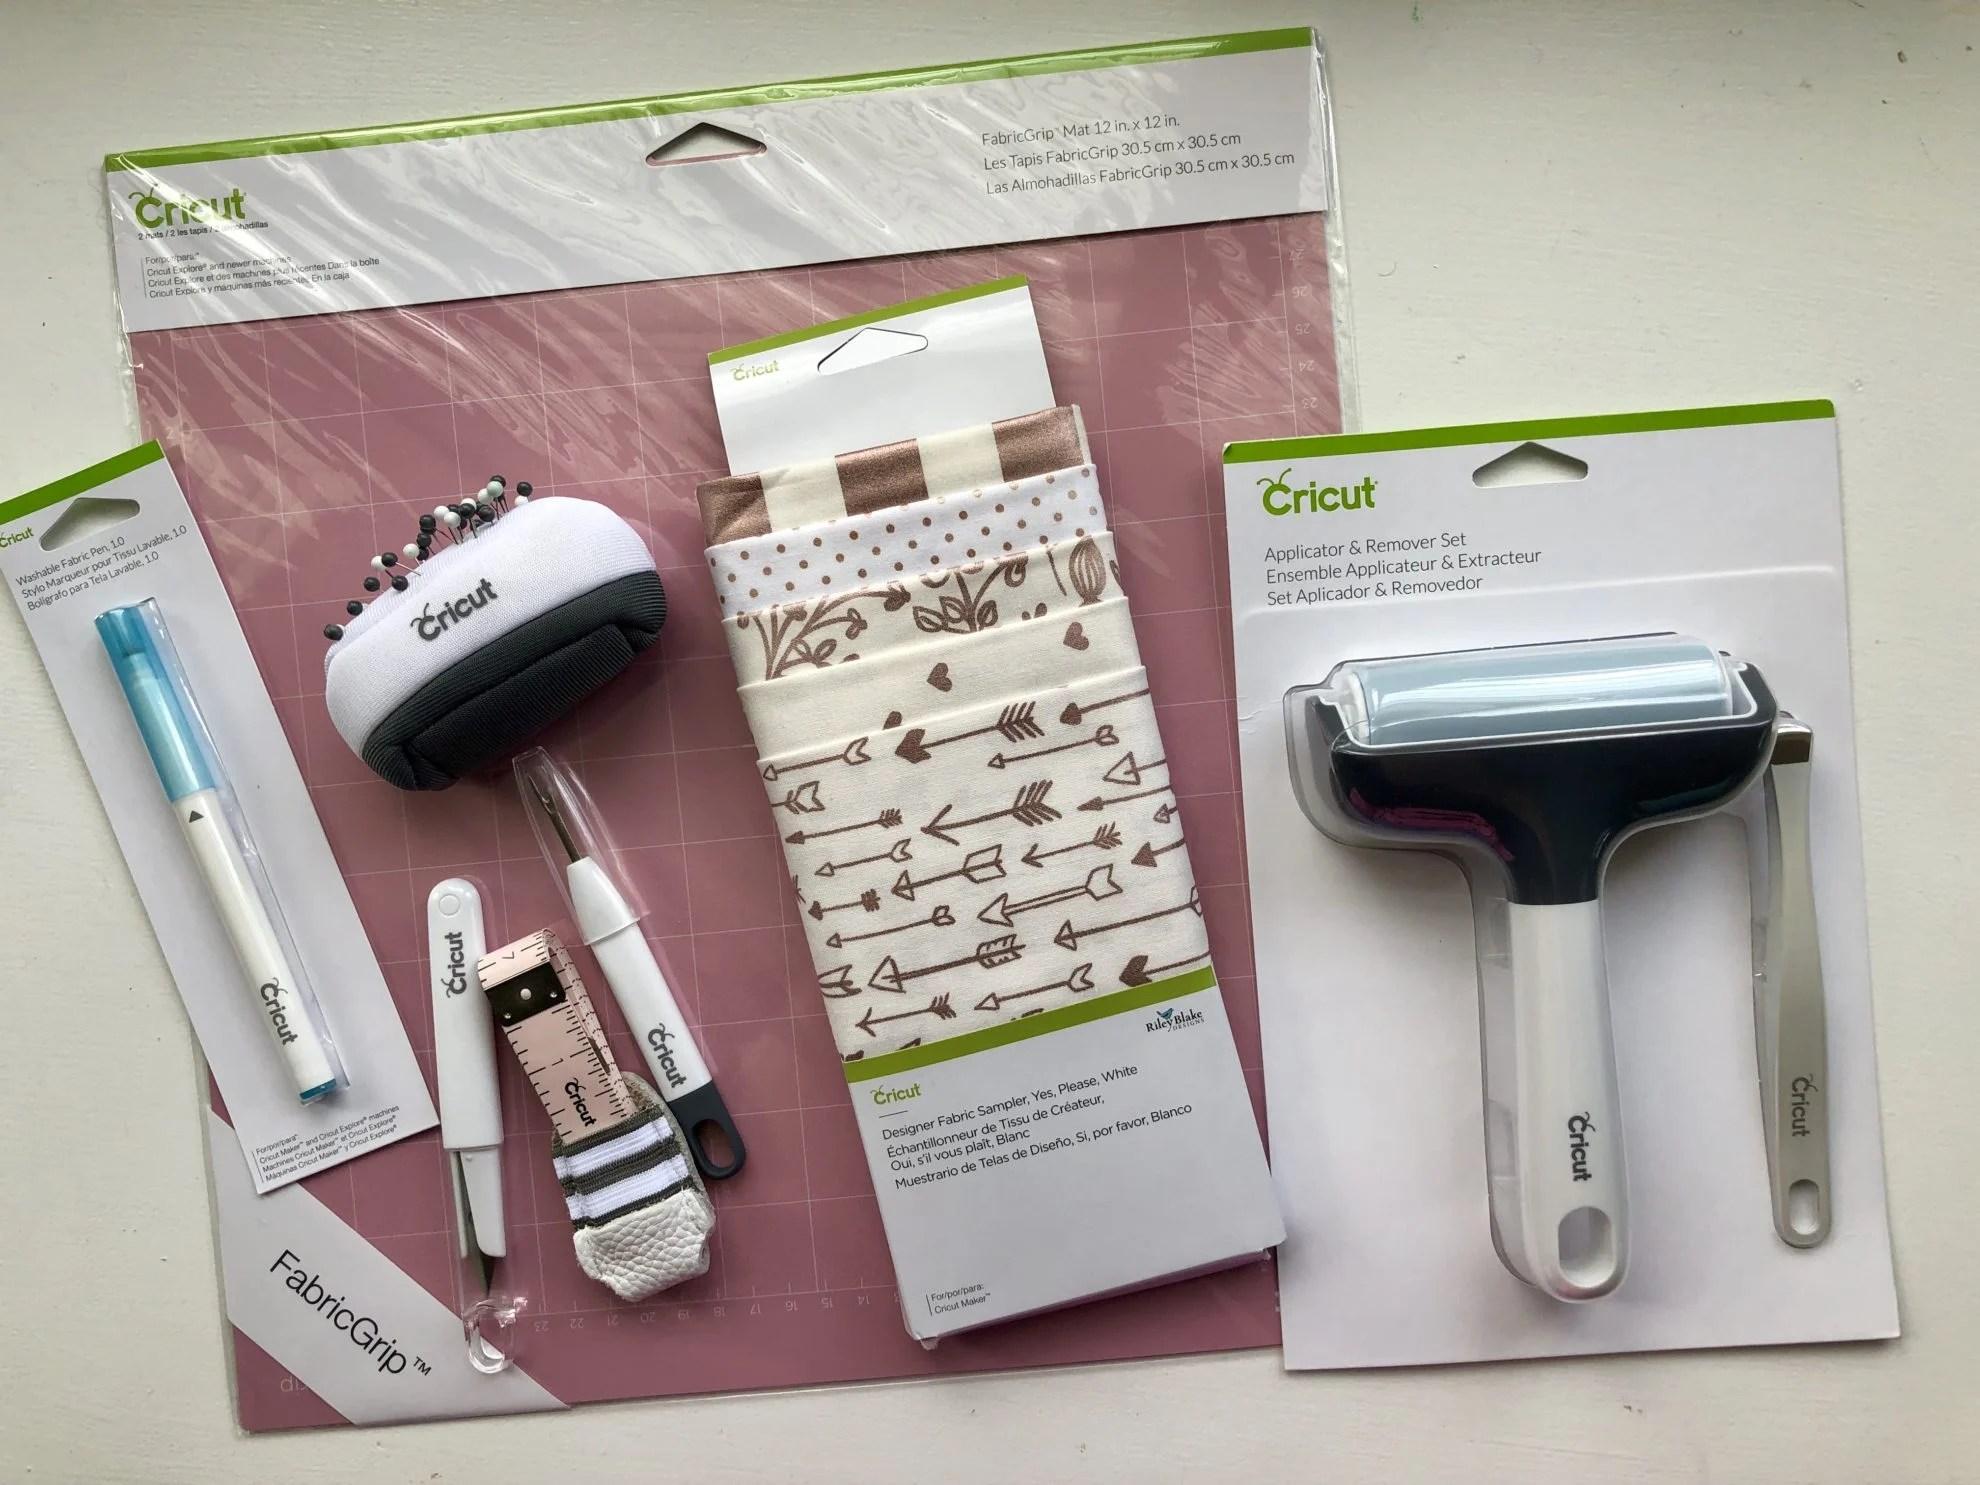 Cricut Sewing Accessories; FabricGrip Mat, brayer, fabric, pin cushion, etc